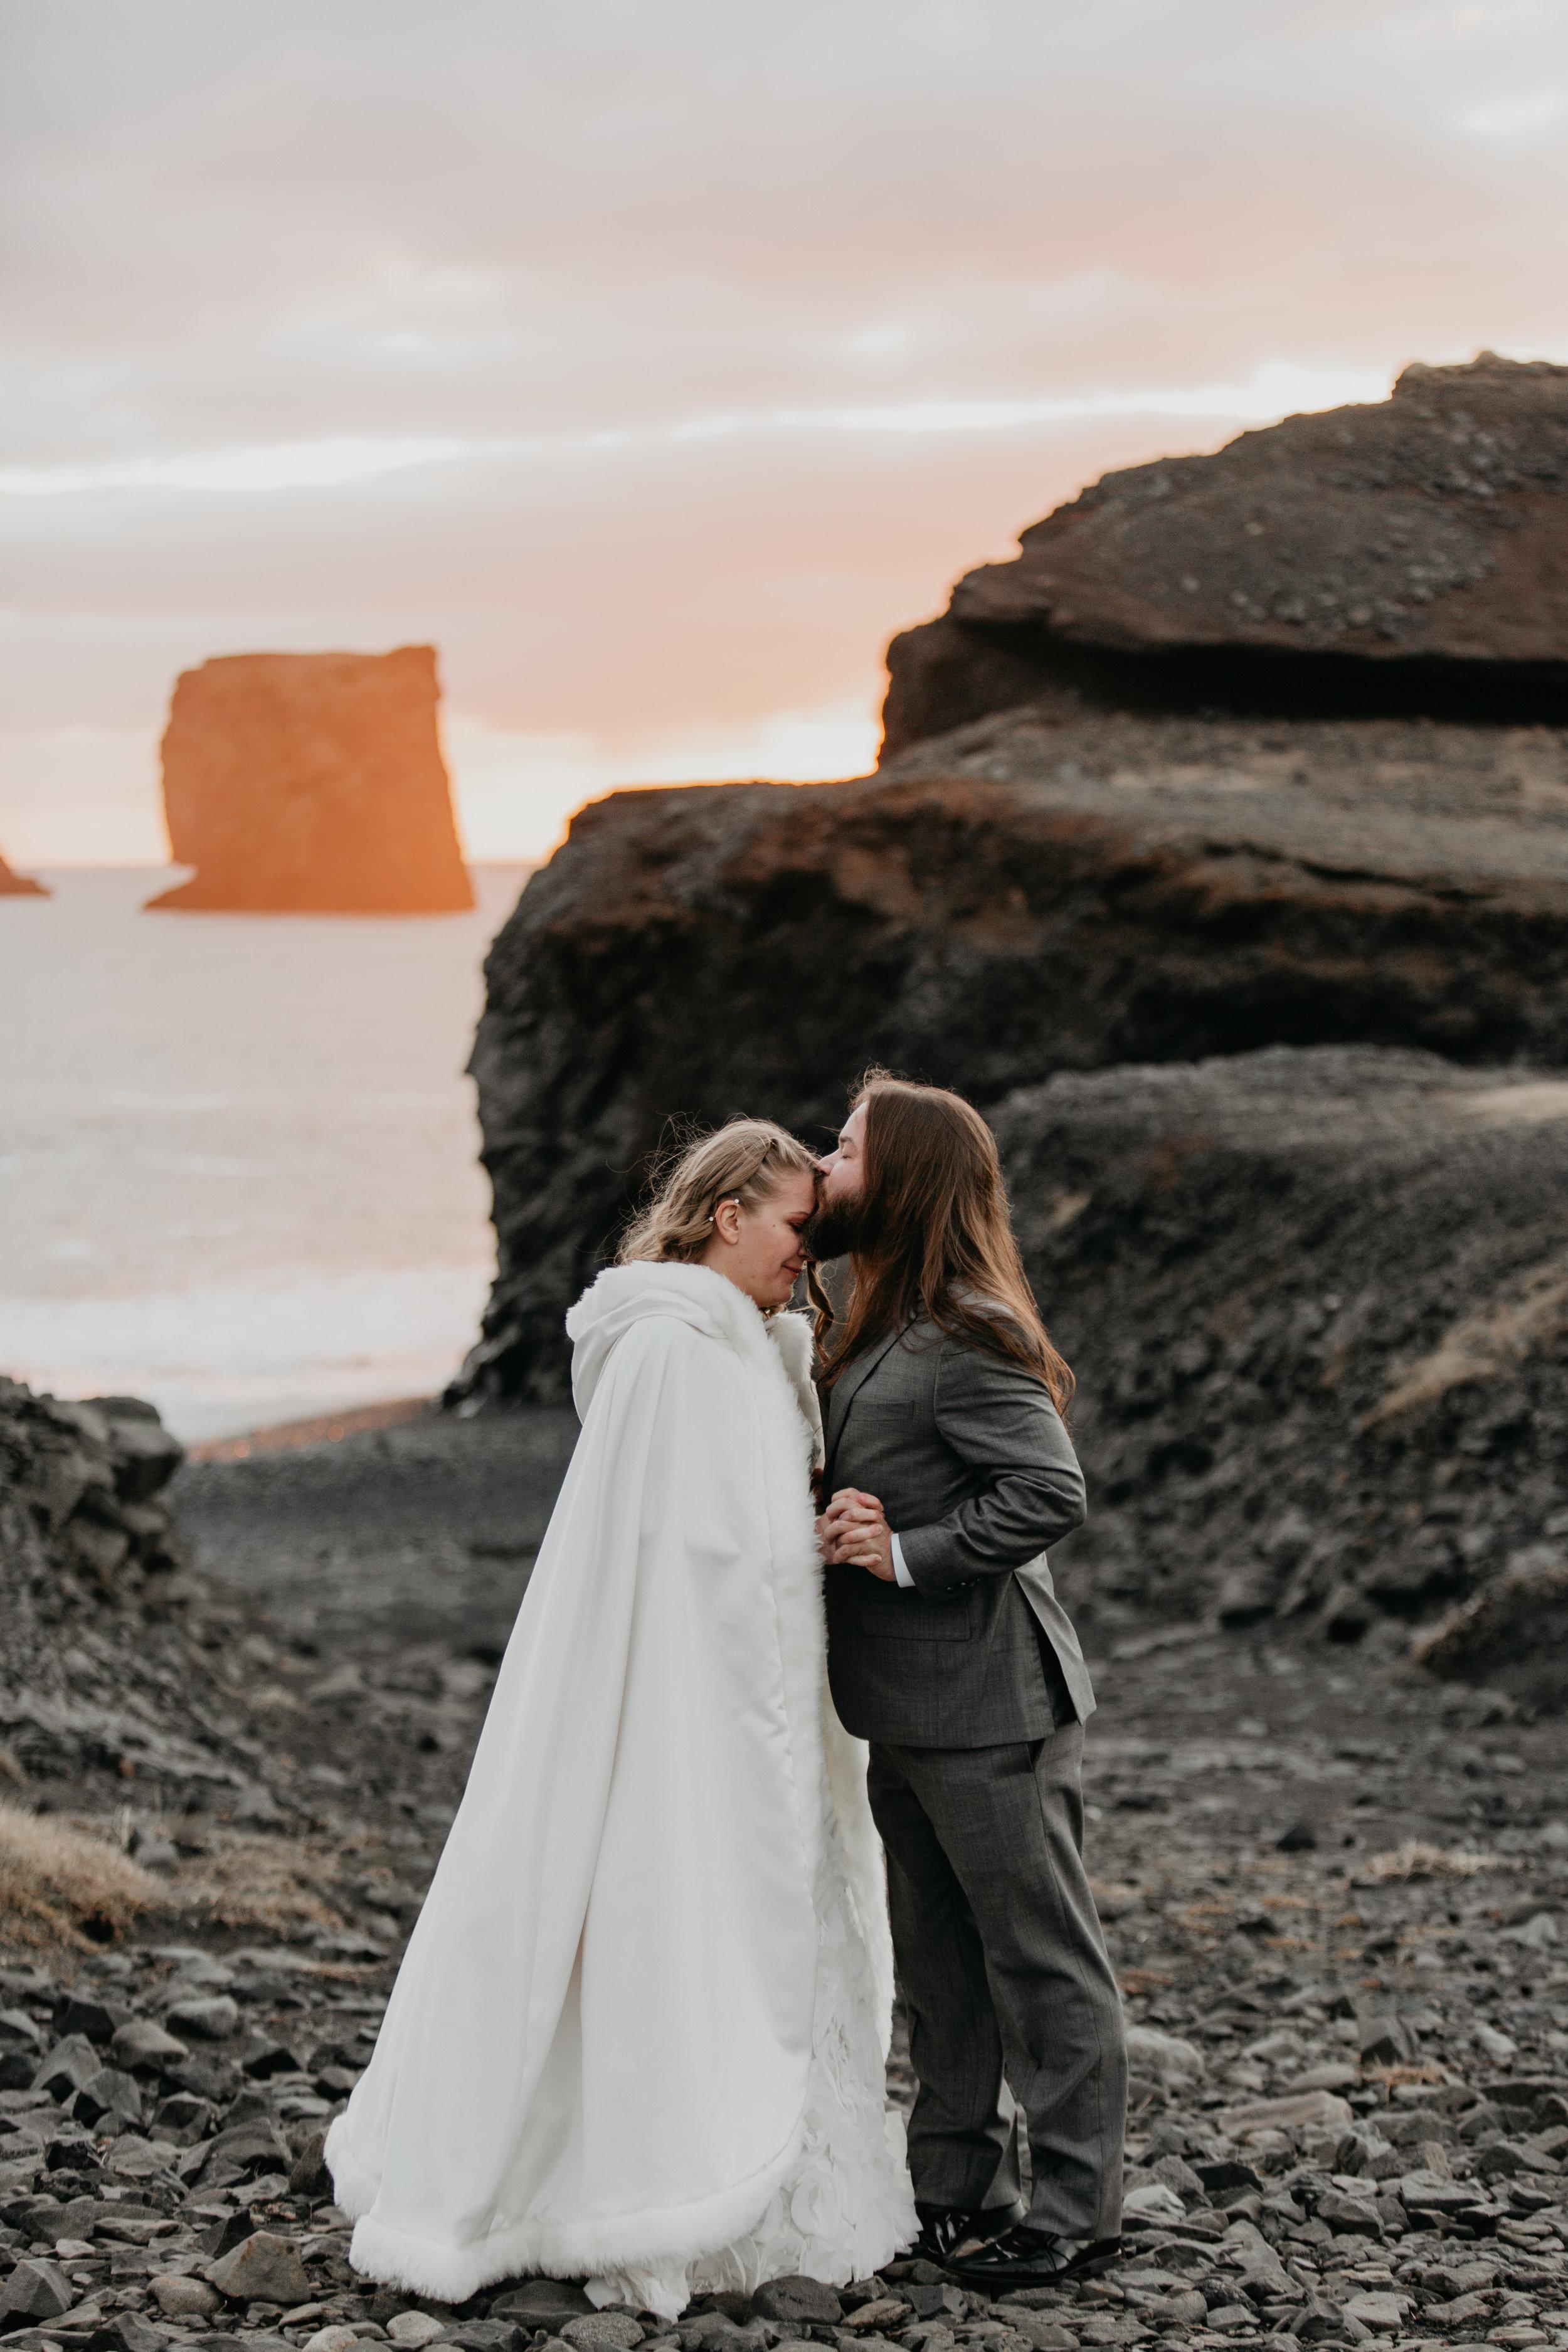 nicole-daacke-photography-iceland-winter-sunset-adventure-elopement-skogafoss-waterfall-black-sand-beach-dyrholaey-vik-iceland-intimate-wedding-black-church-elopement-photographer-47.jpg